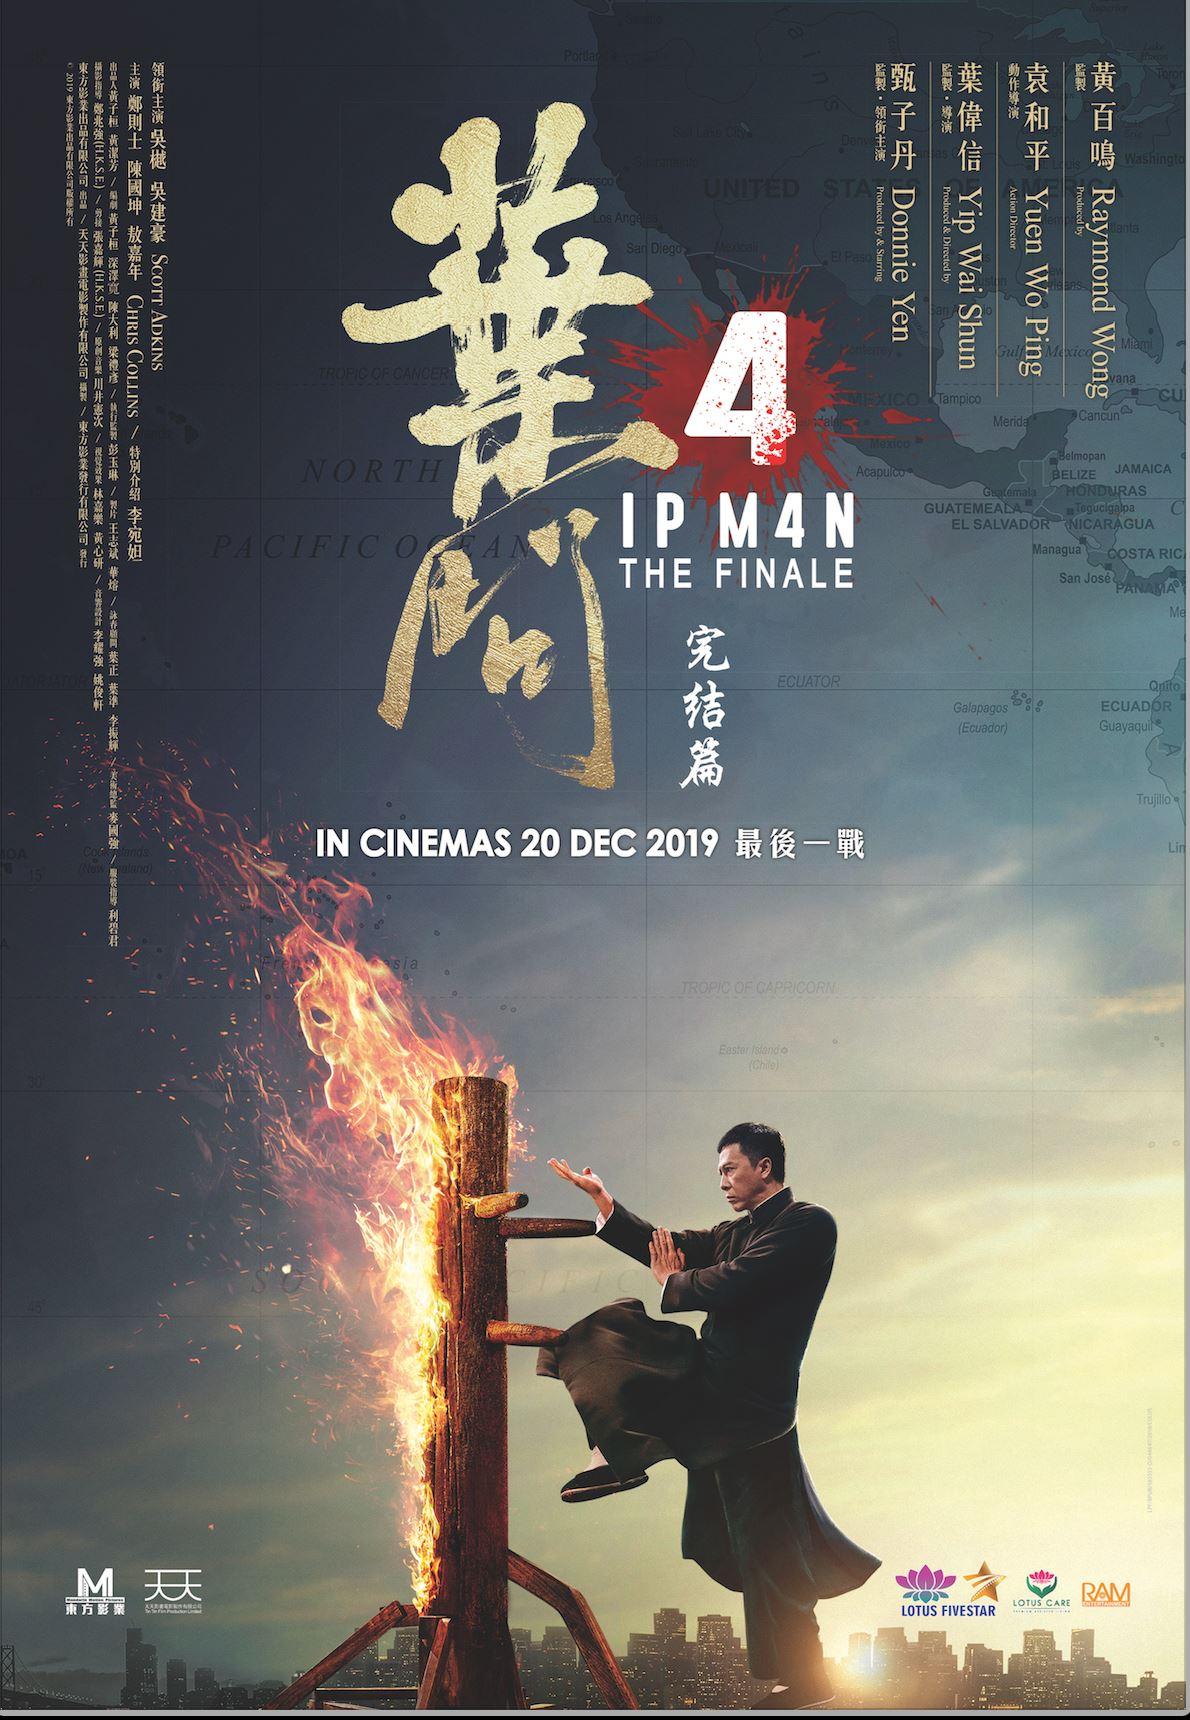 wayang zayan - ip man 4 :the finale